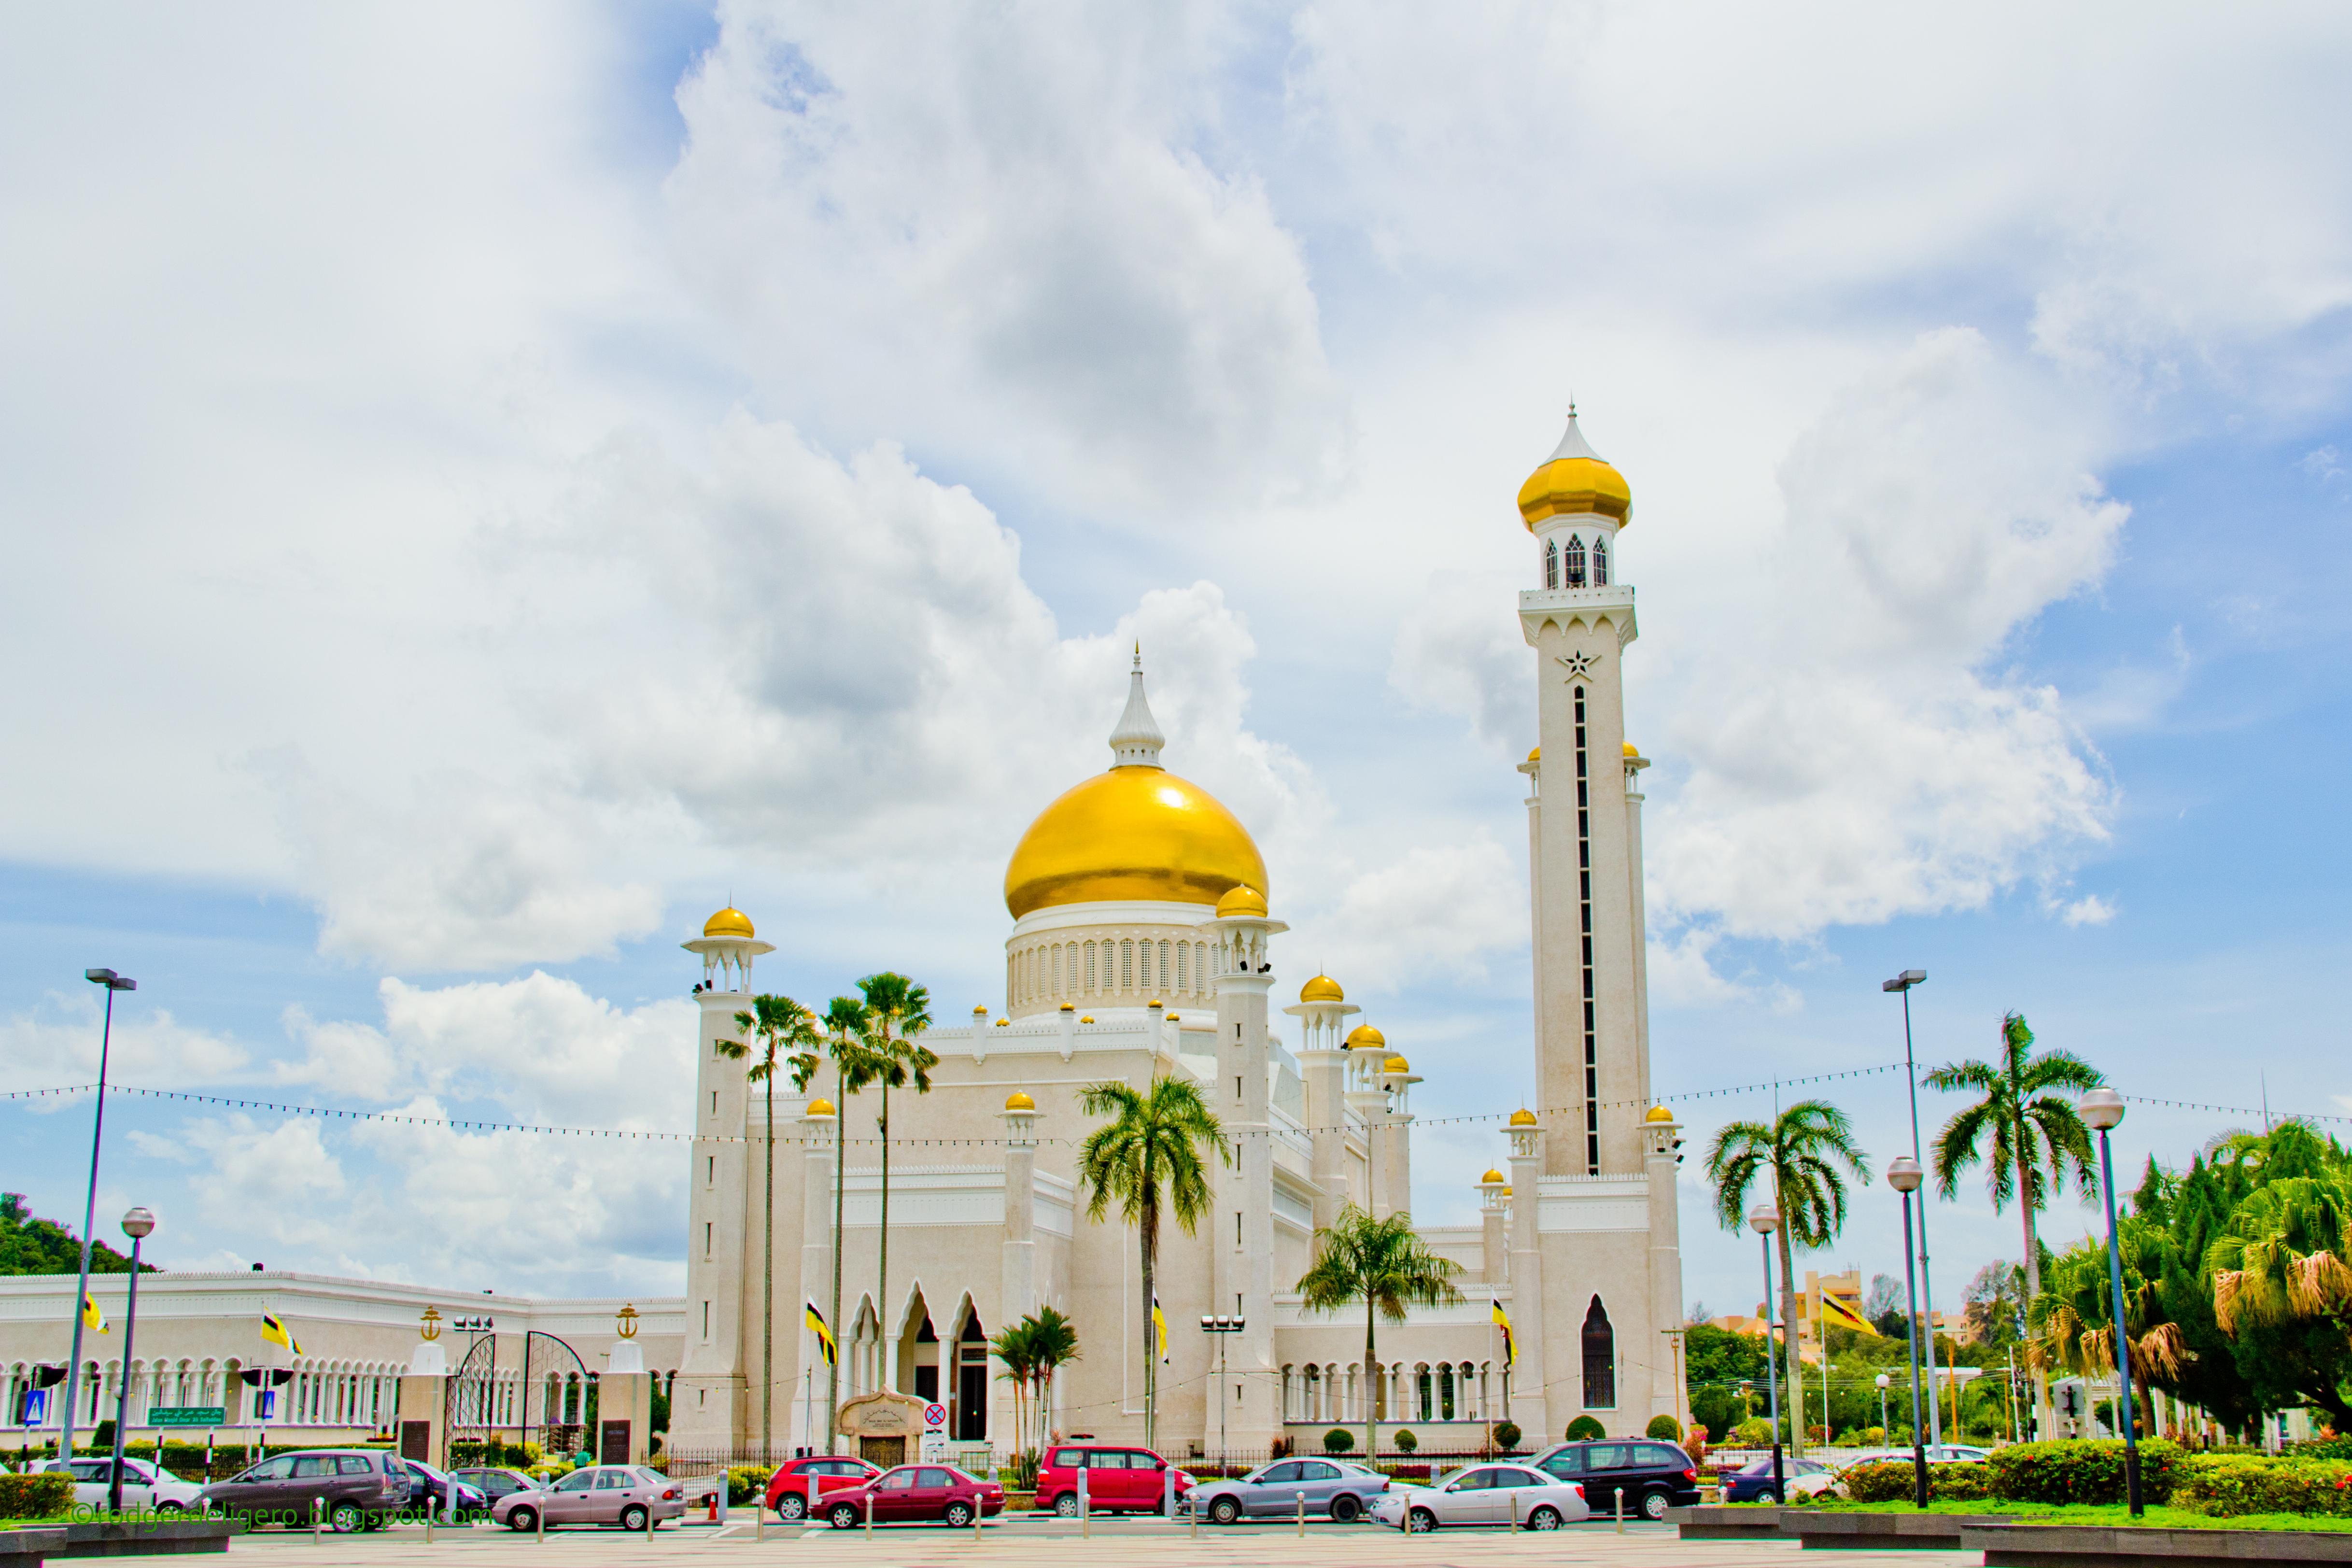 The Majestic Mosque. The Sultan Omar Ali Saifuddin Mosque ... Beautiful Masjid On Water